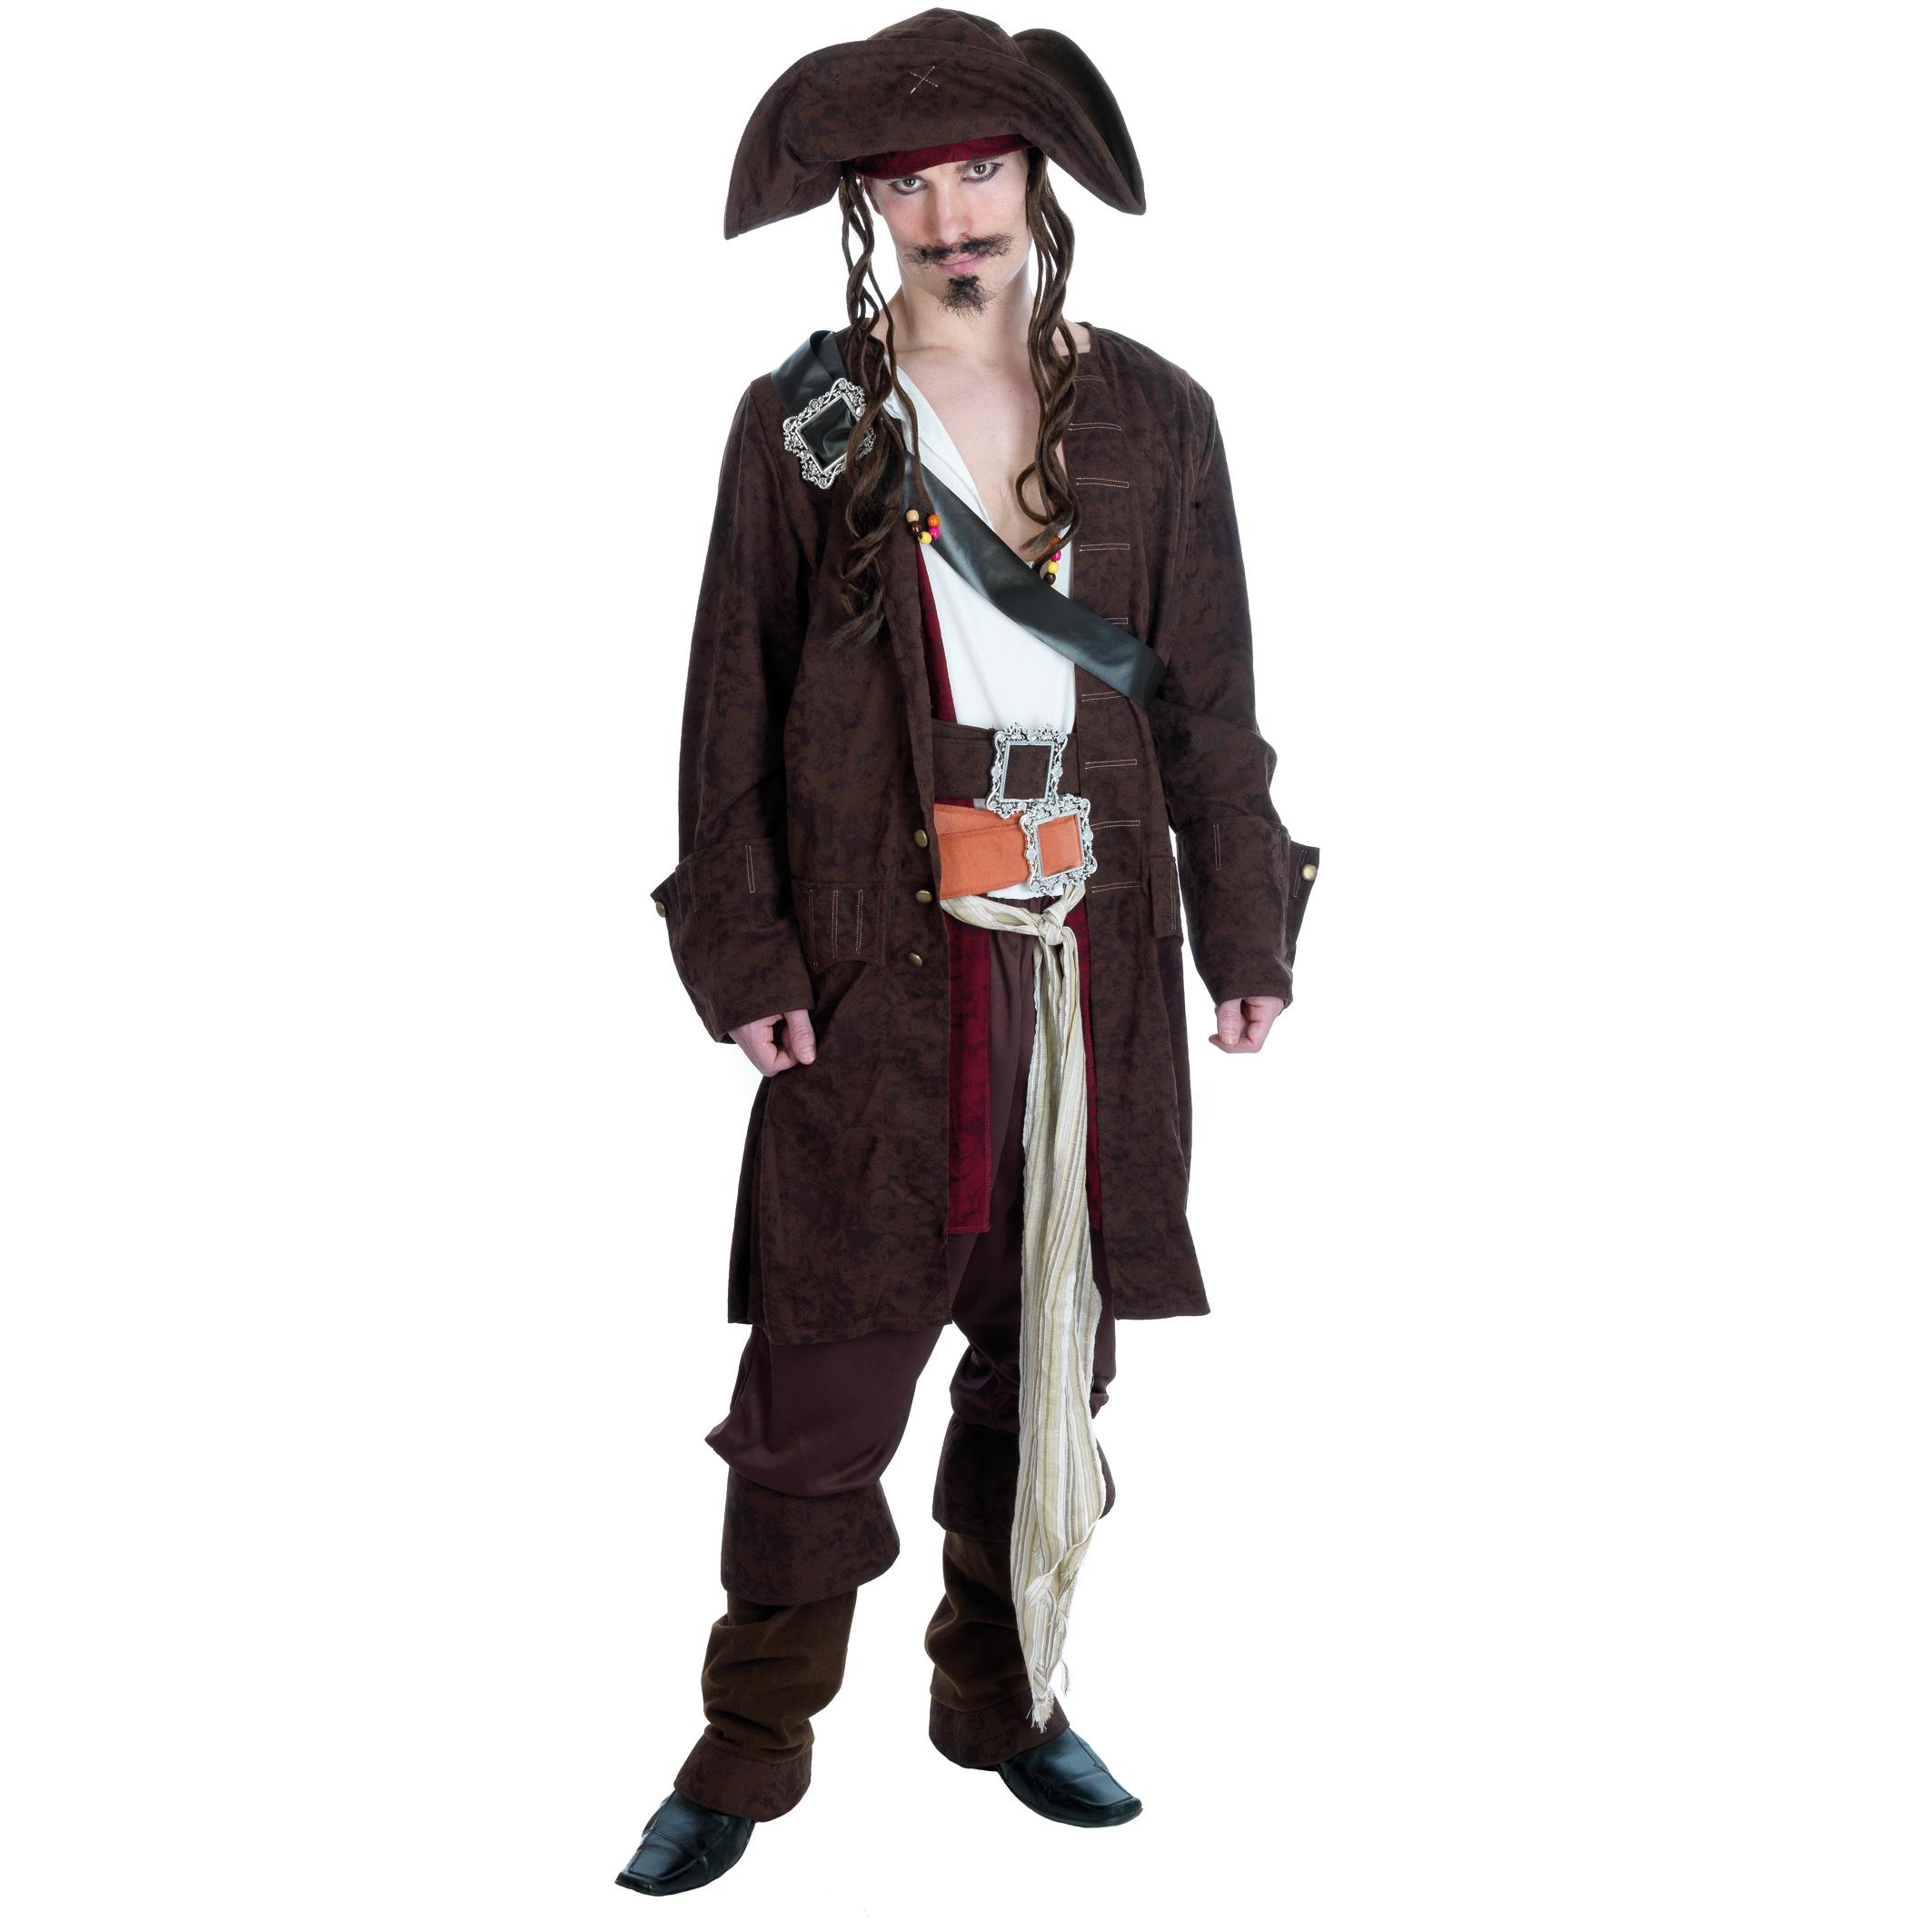 Costume capitan jack sparrow pirati dei caraibi pirata